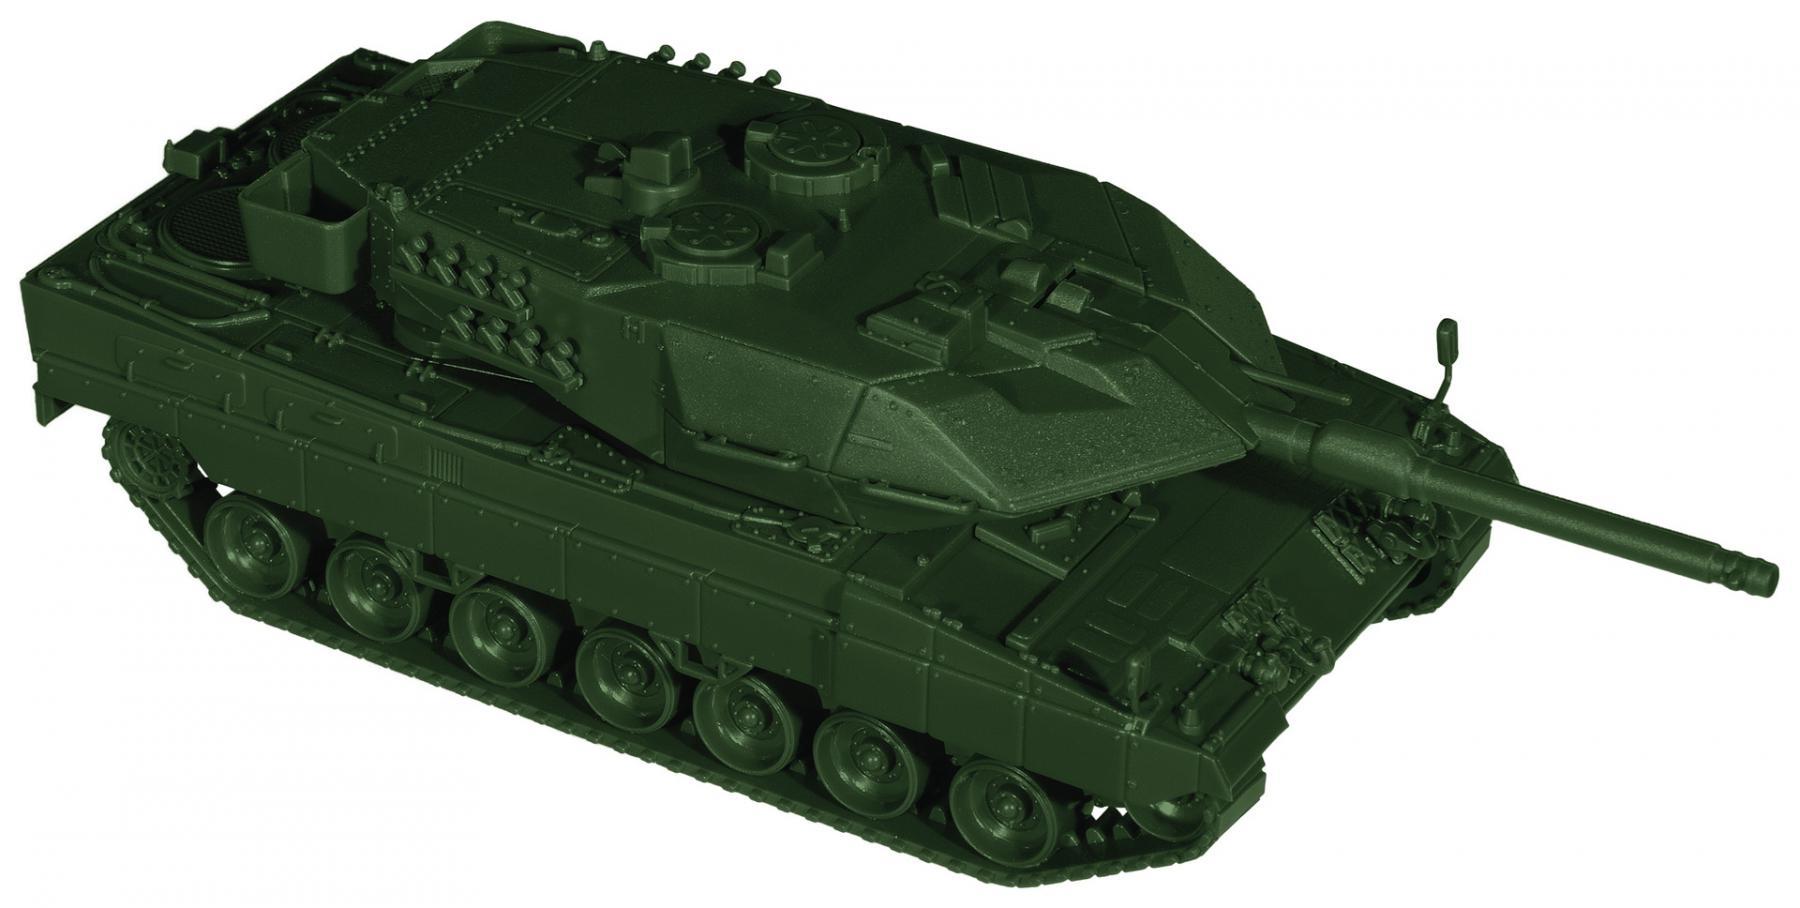 roco 05151 kampfpanzer leopard 2 a5 kaufen bei. Black Bedroom Furniture Sets. Home Design Ideas